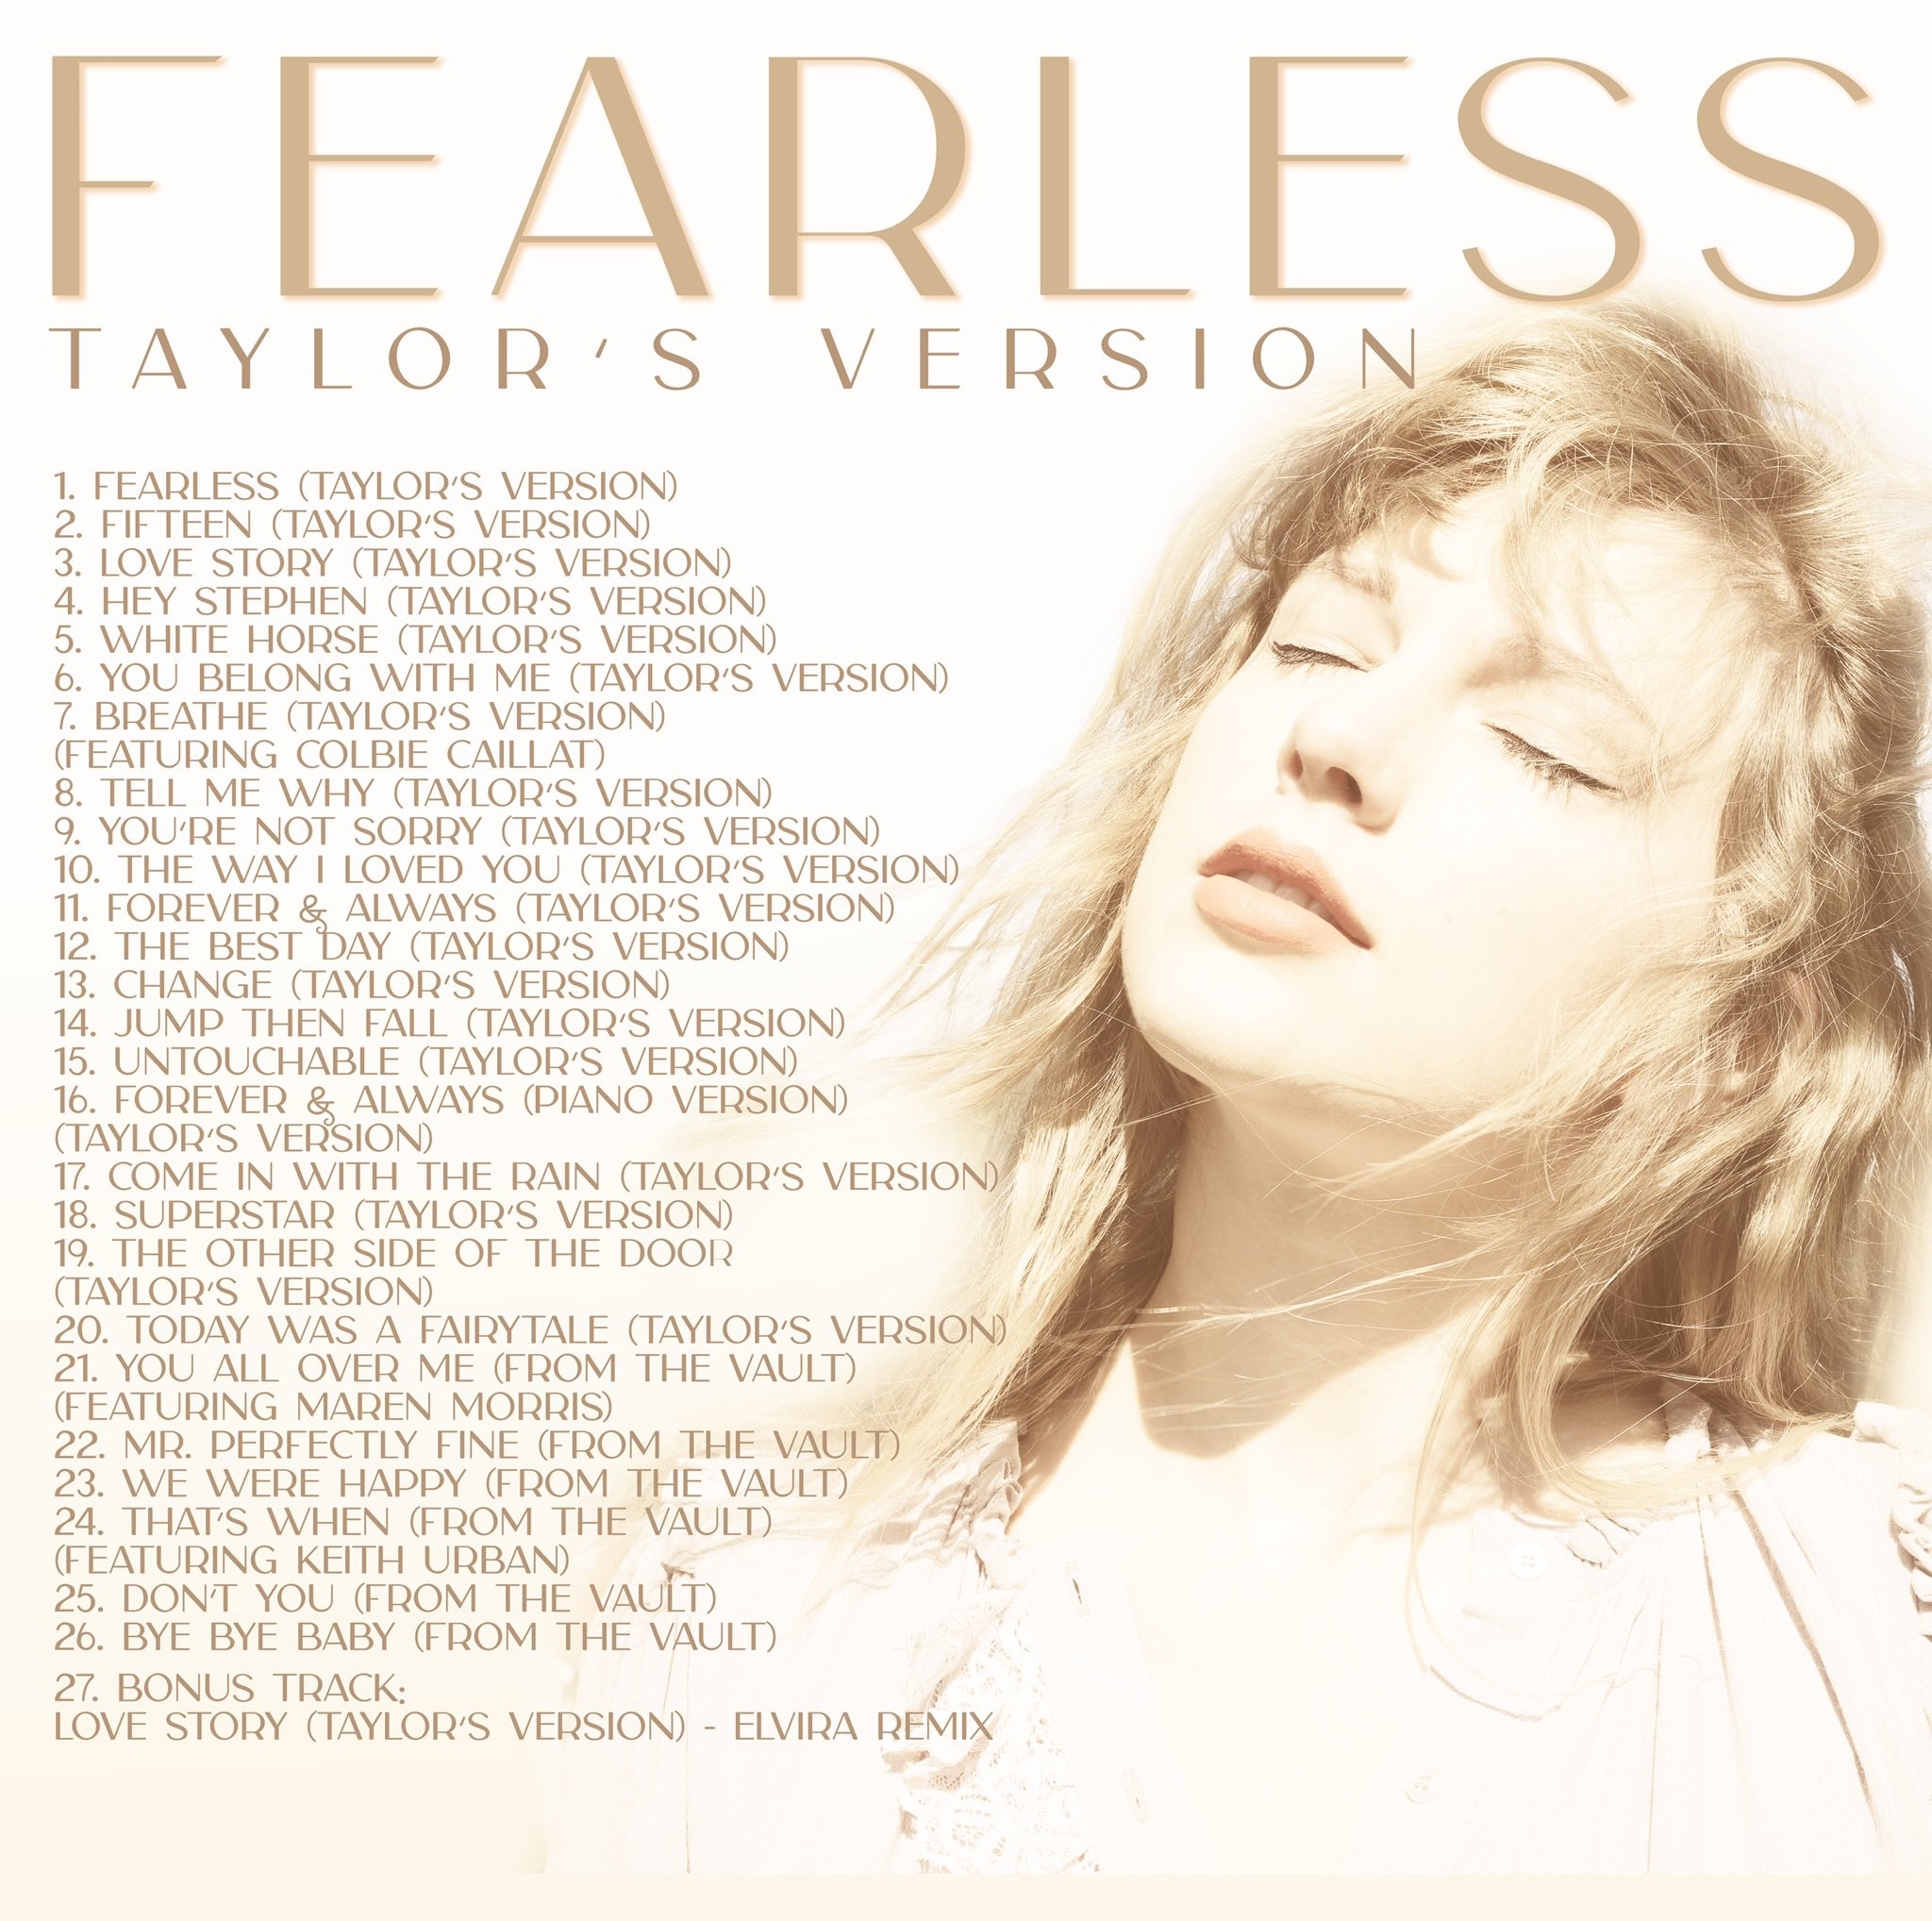 Taylor Swift – Fearless (Taylor's Version) Lyrics and Full Tracklist